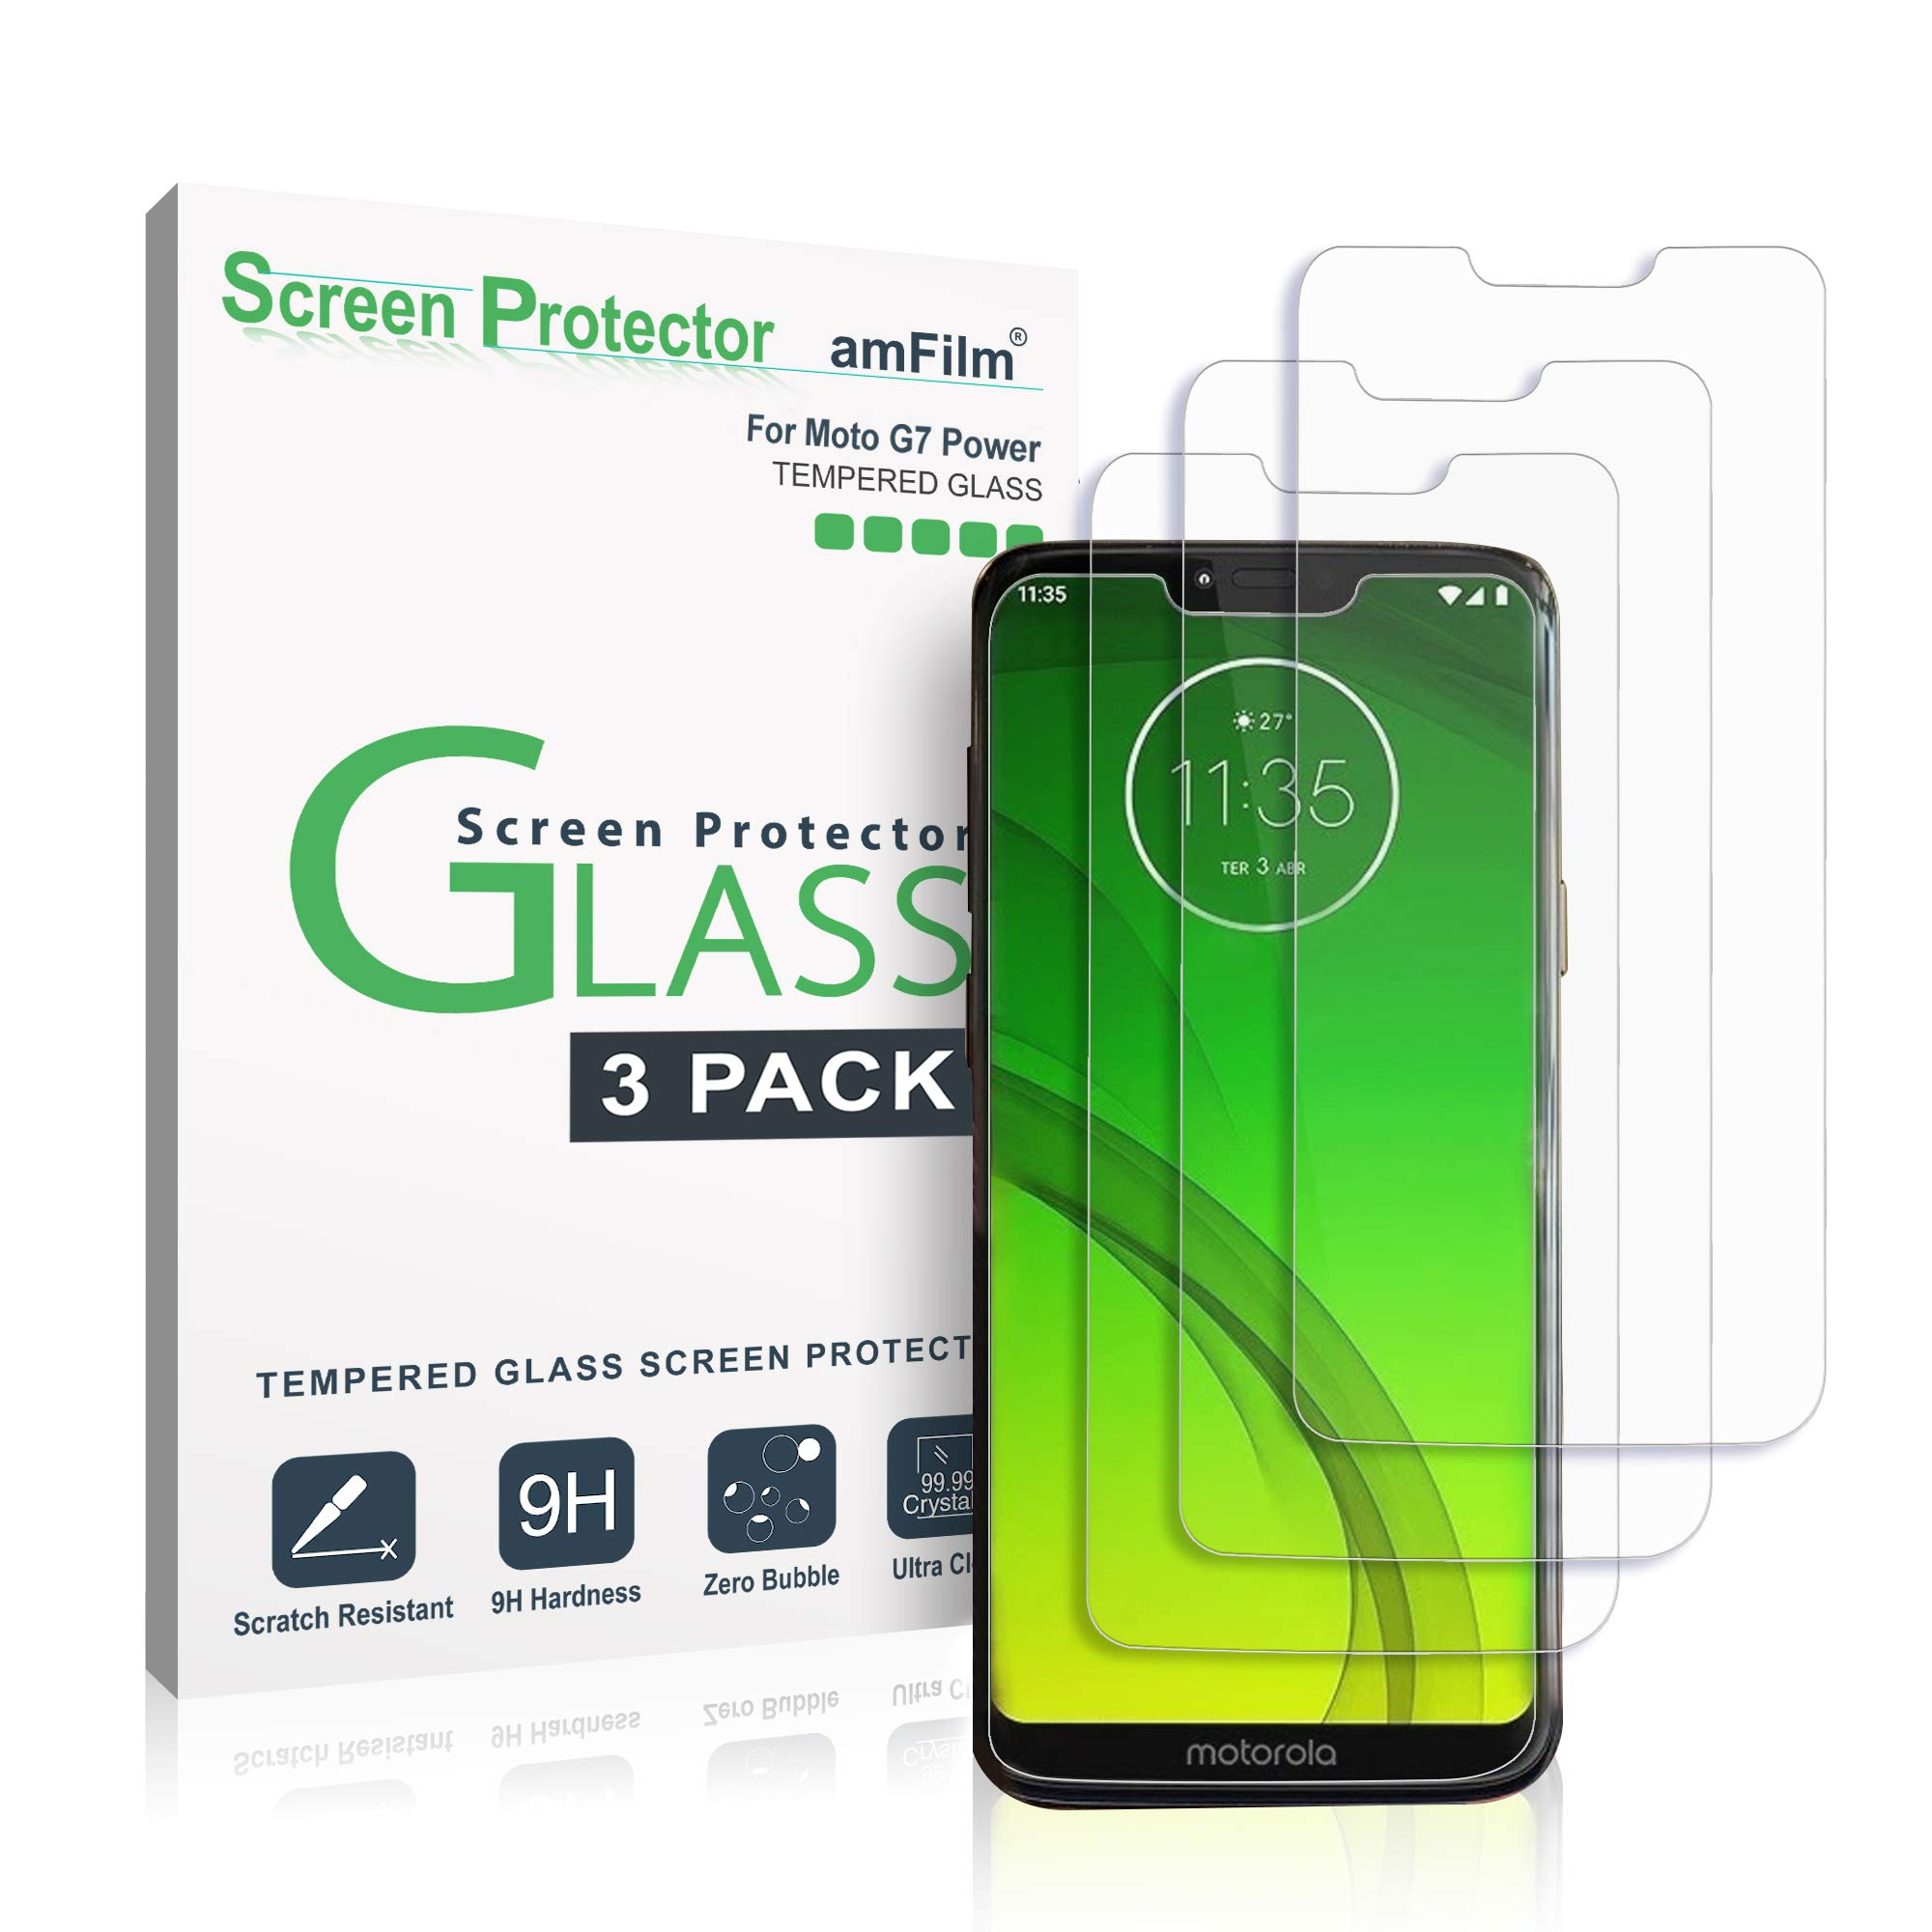 amFilm Tempered Glass Screen Protector for Motorla Moto G7 Power (3 Pack)